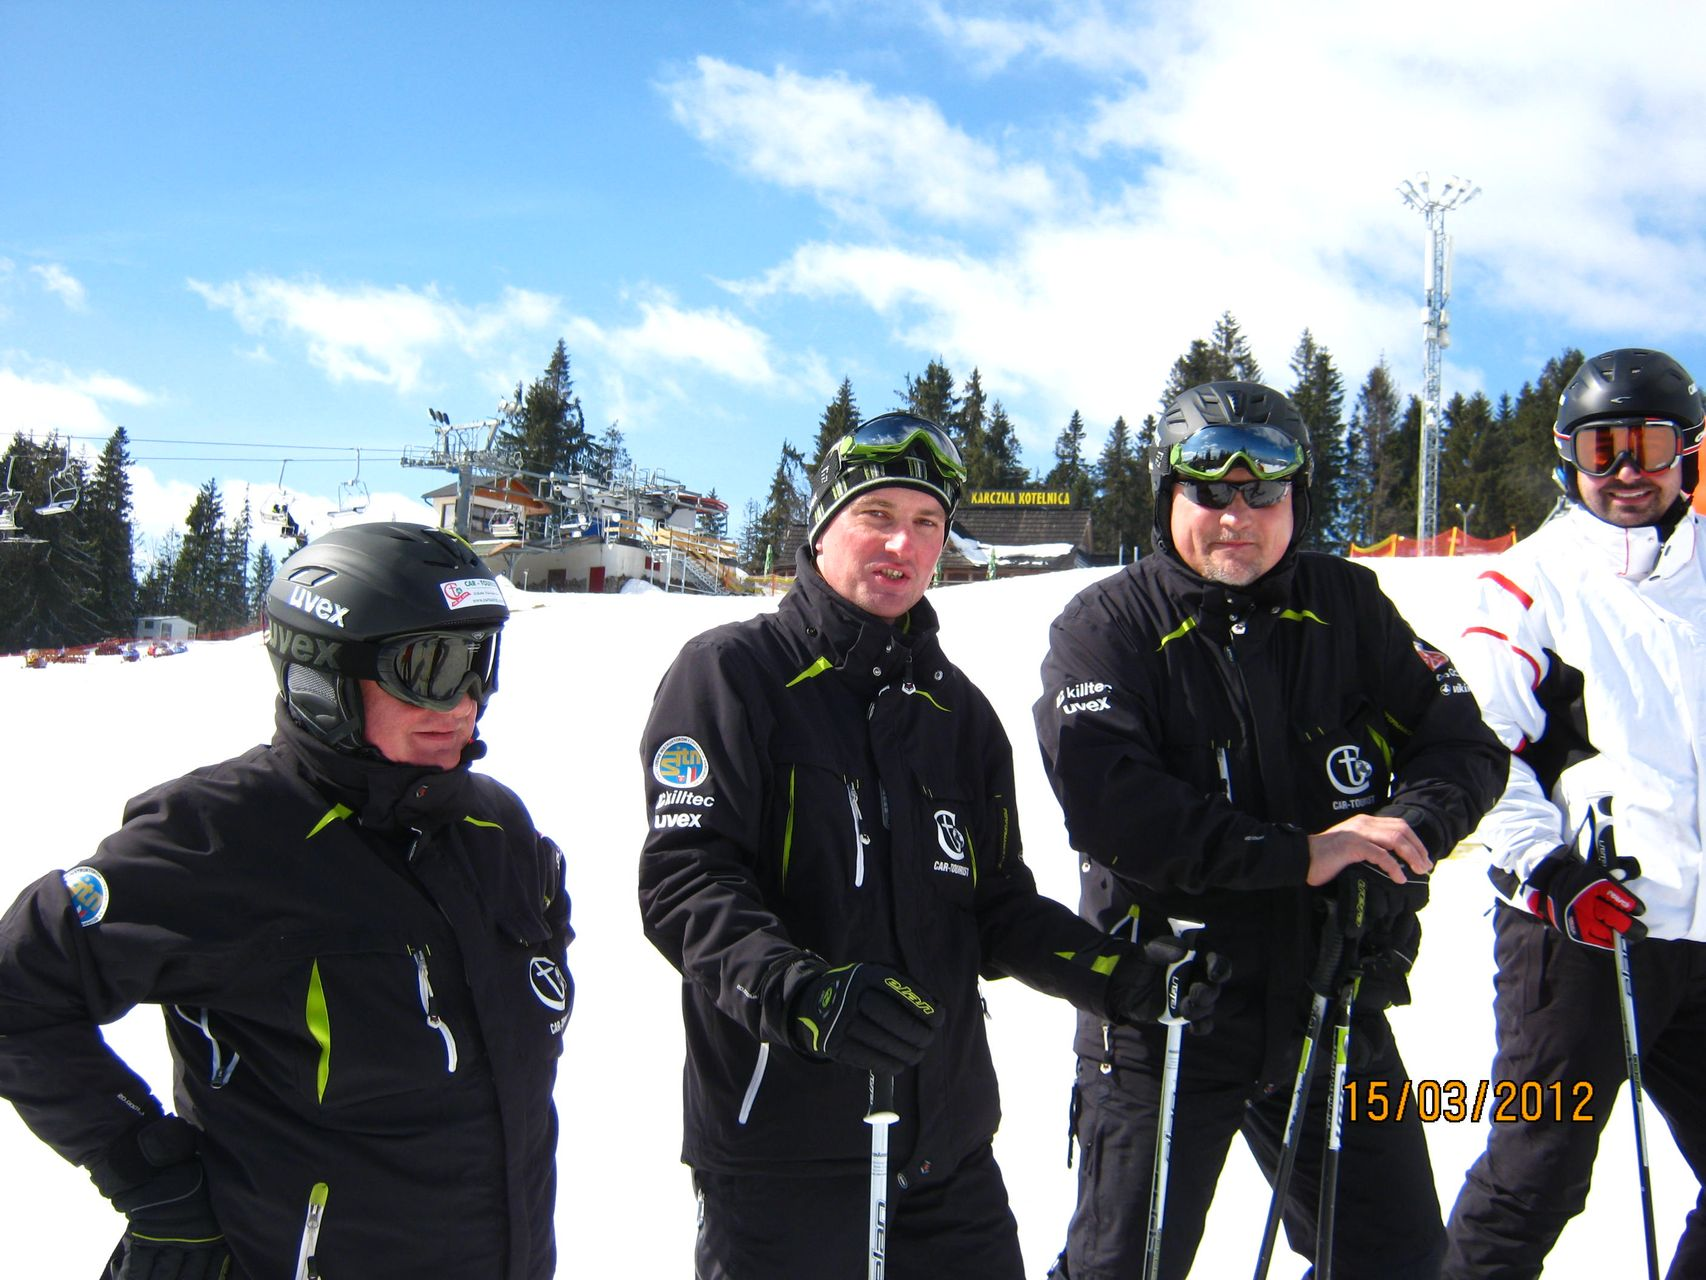 CarTourist_narty-snowboard_2012-foto-1